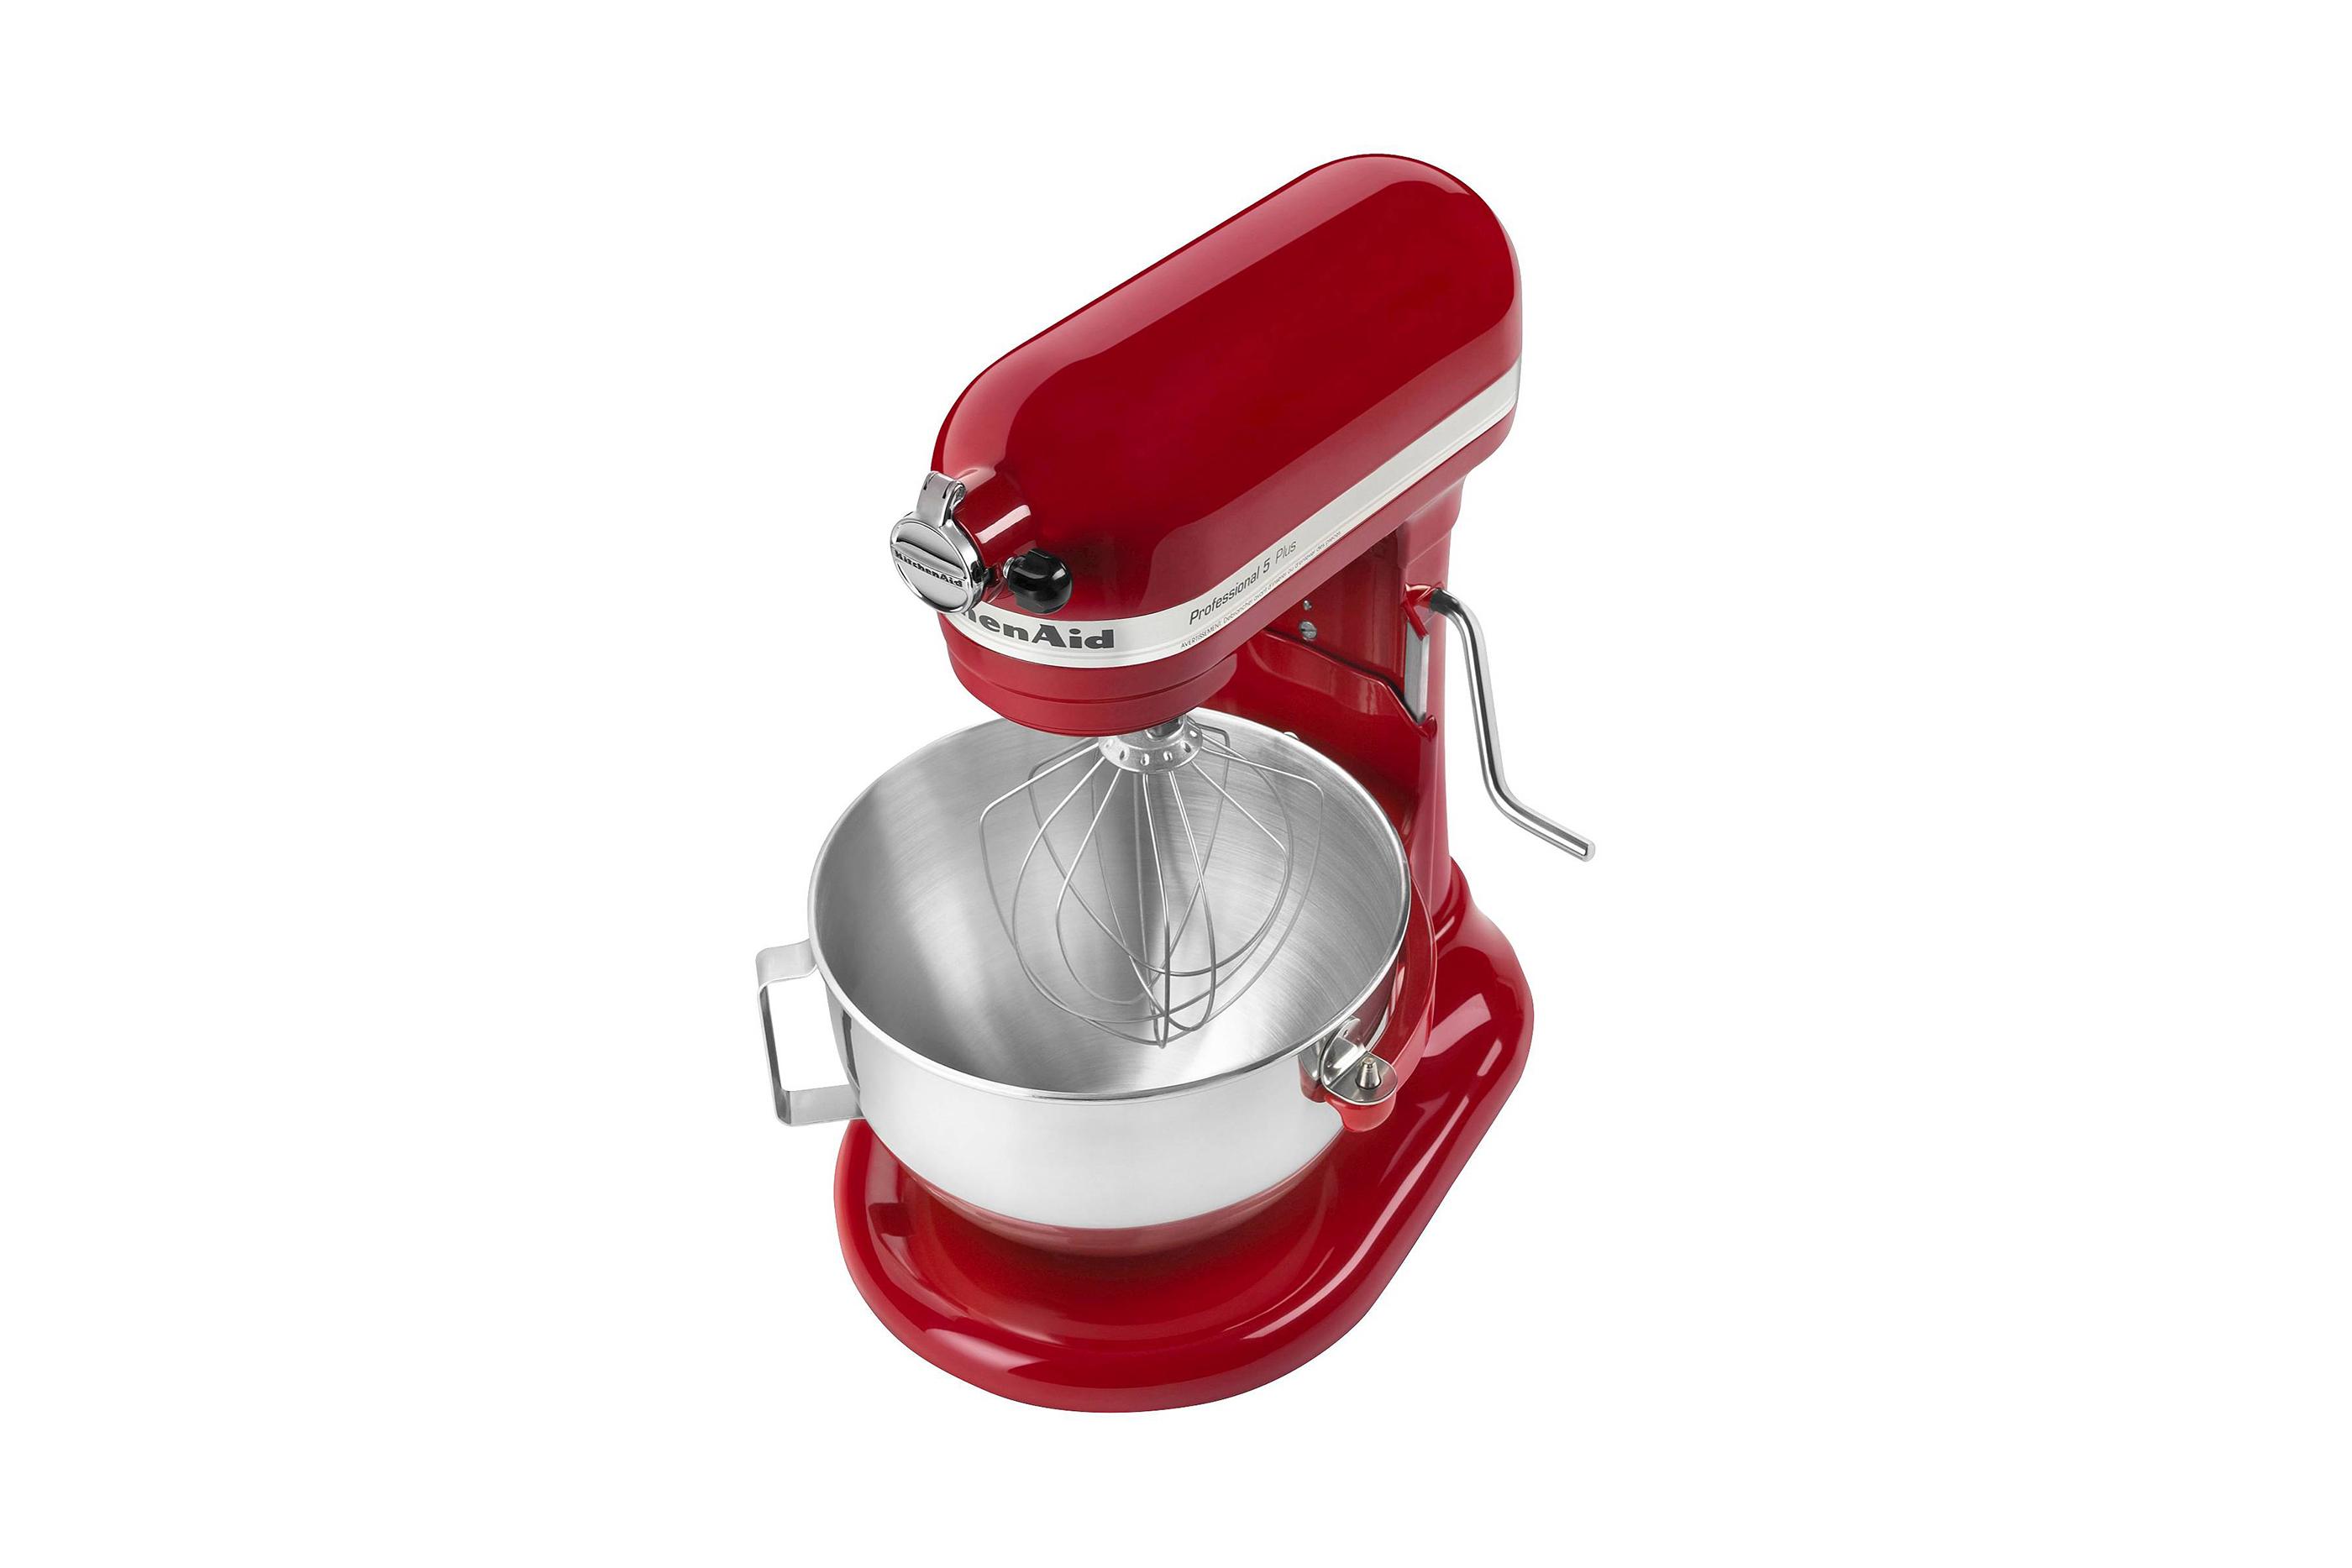 171110-target-black-friday-savings-stand-mixer